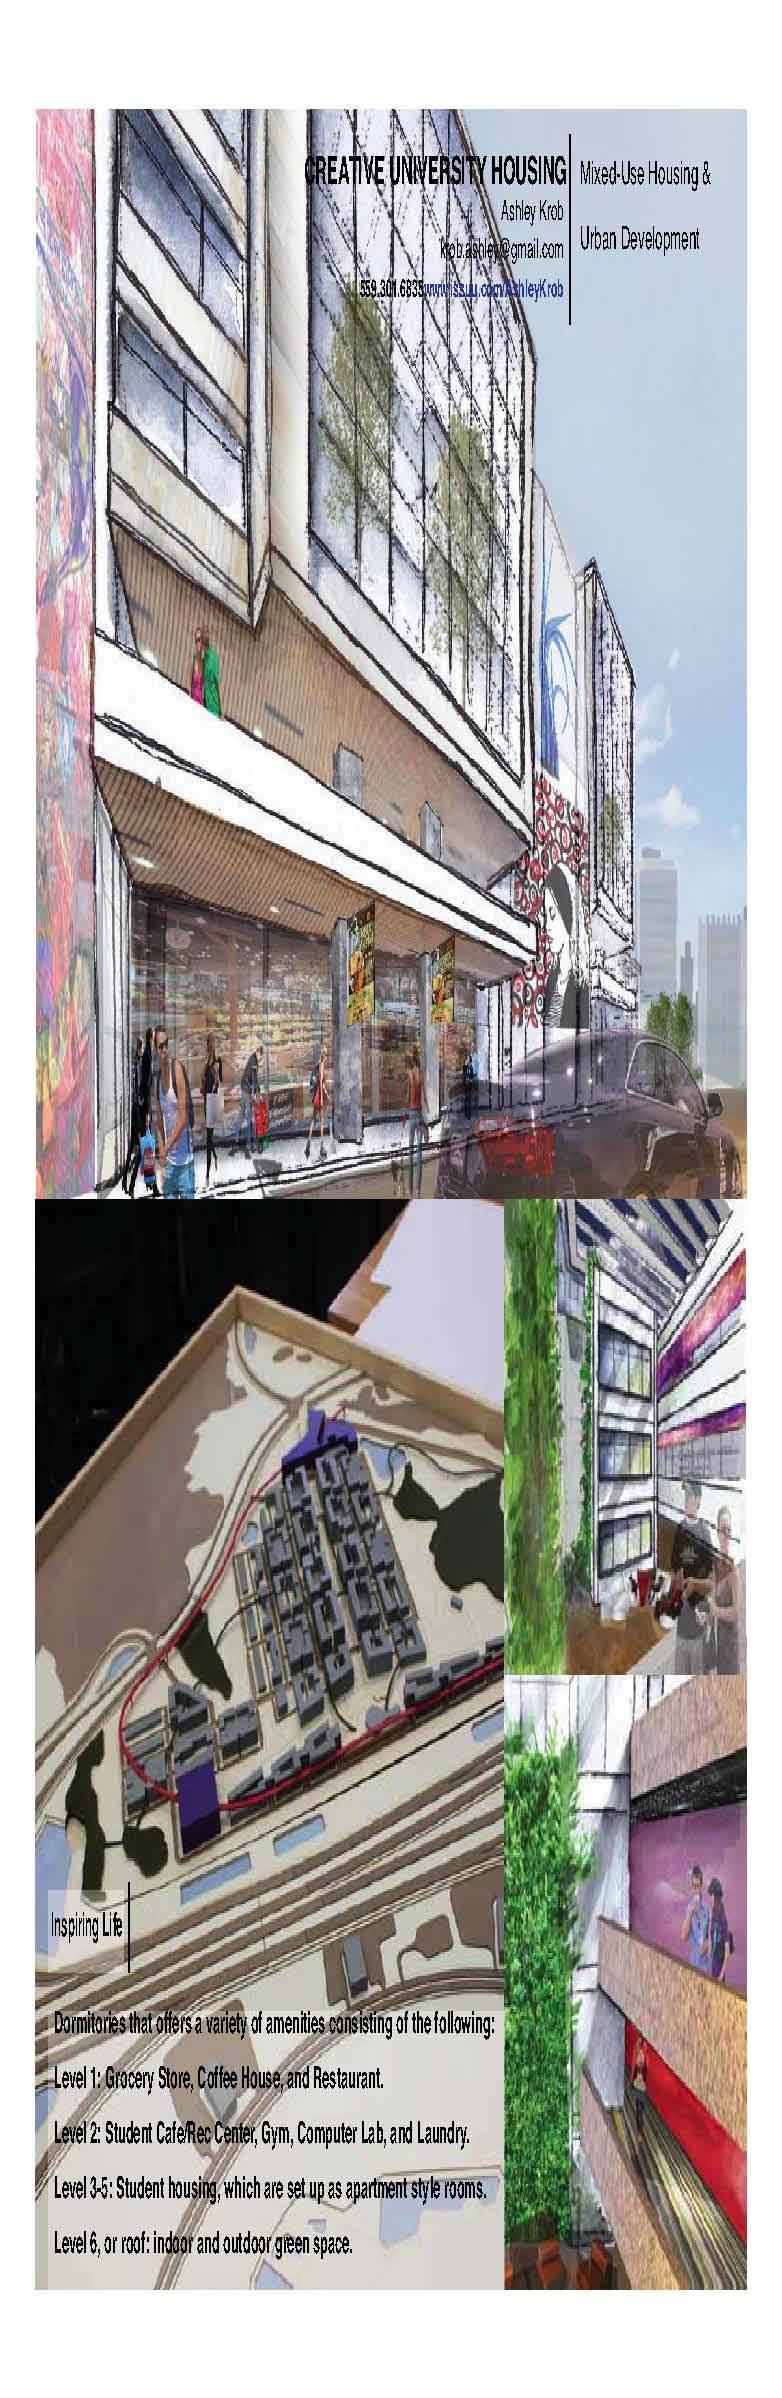 Creative University. Florida. A combination of Urban, Architecture, and Interior Design.